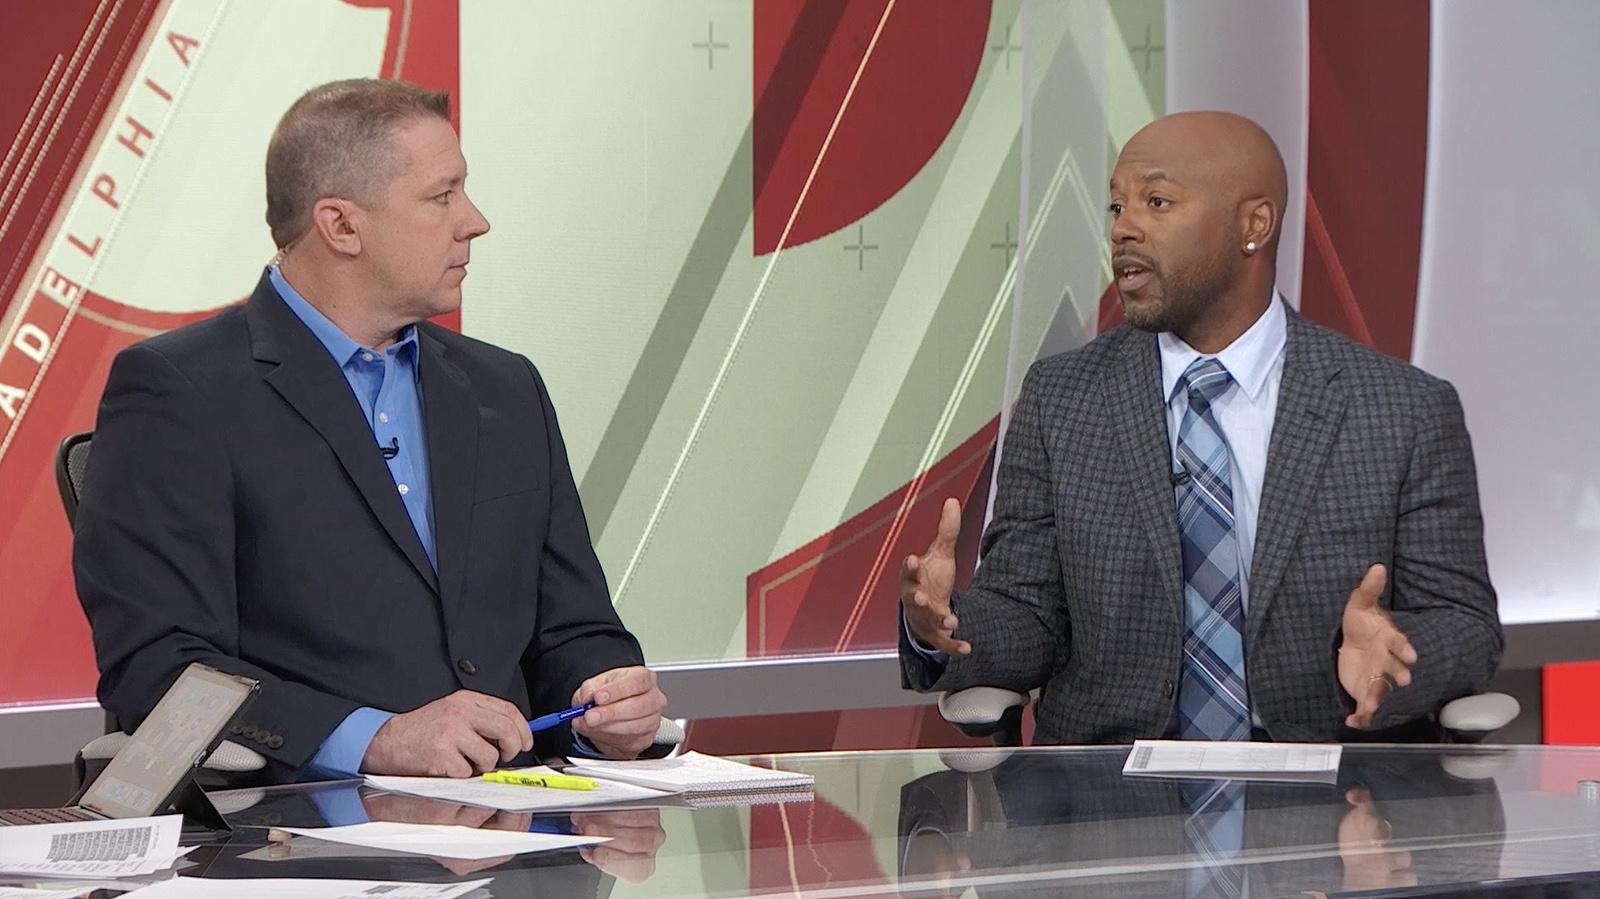 NCS_NBC-Sports-Philadelphia_0008